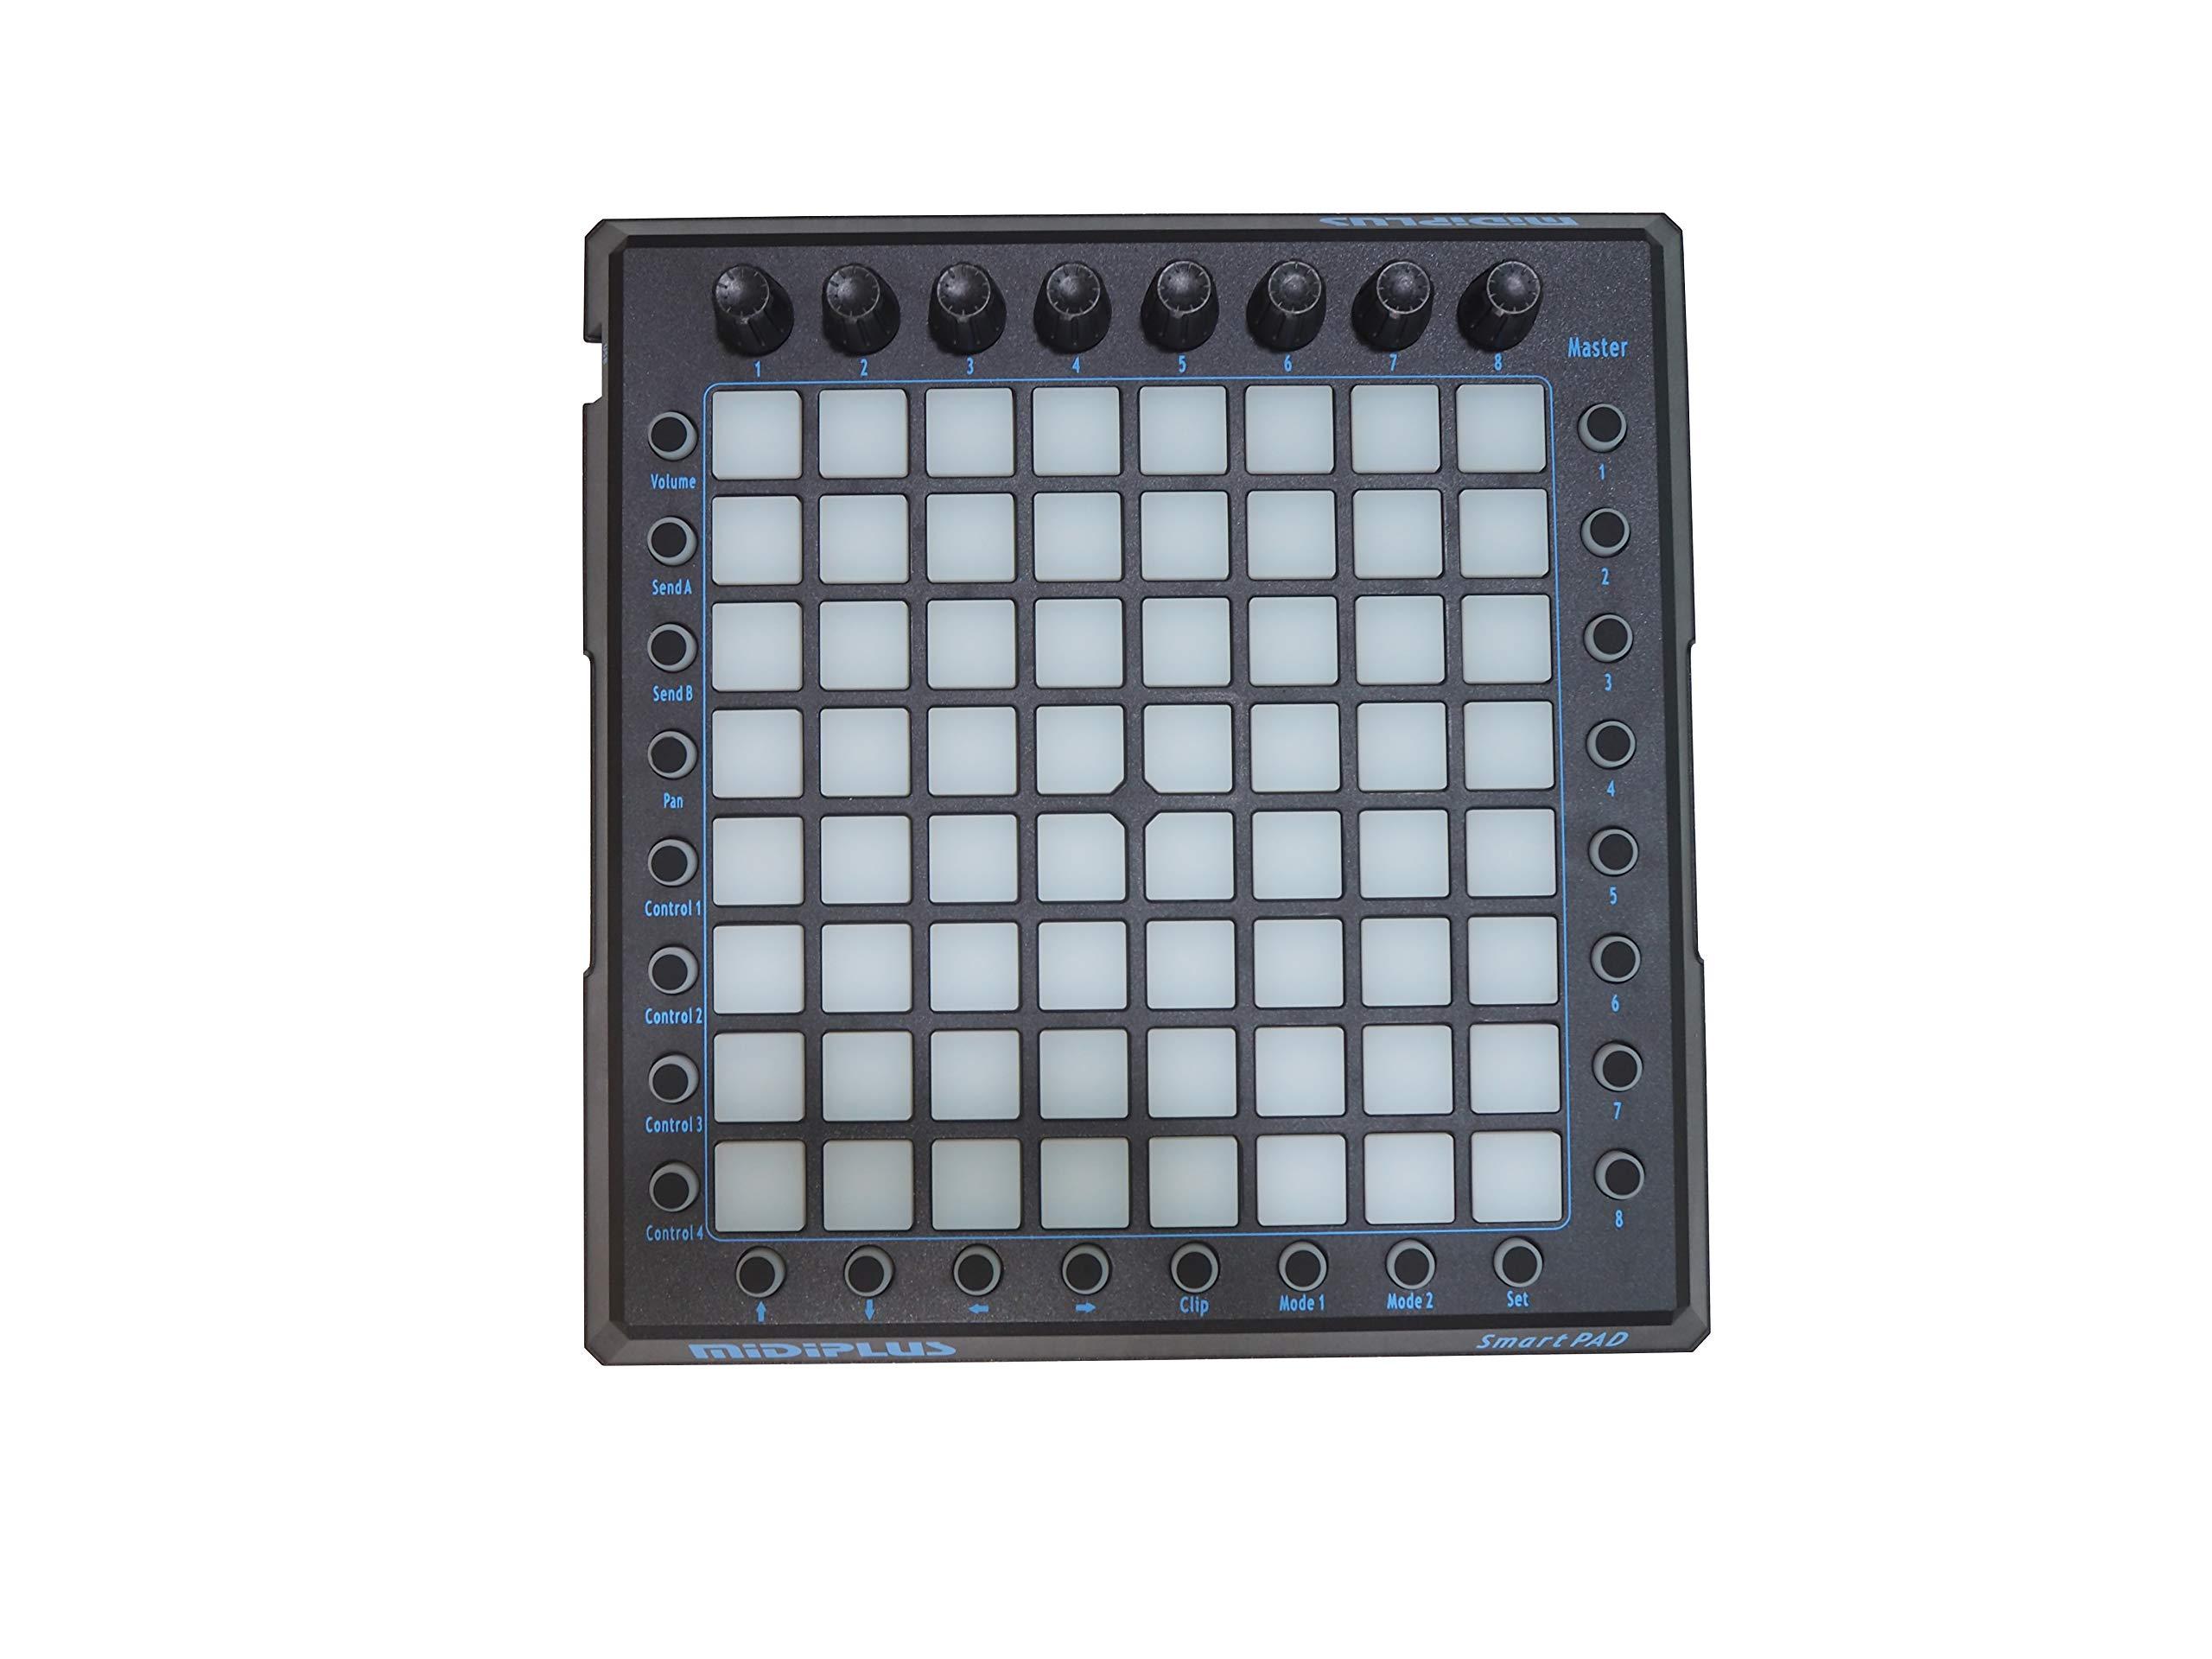 midiplus Smartpad USB MIDI Controller